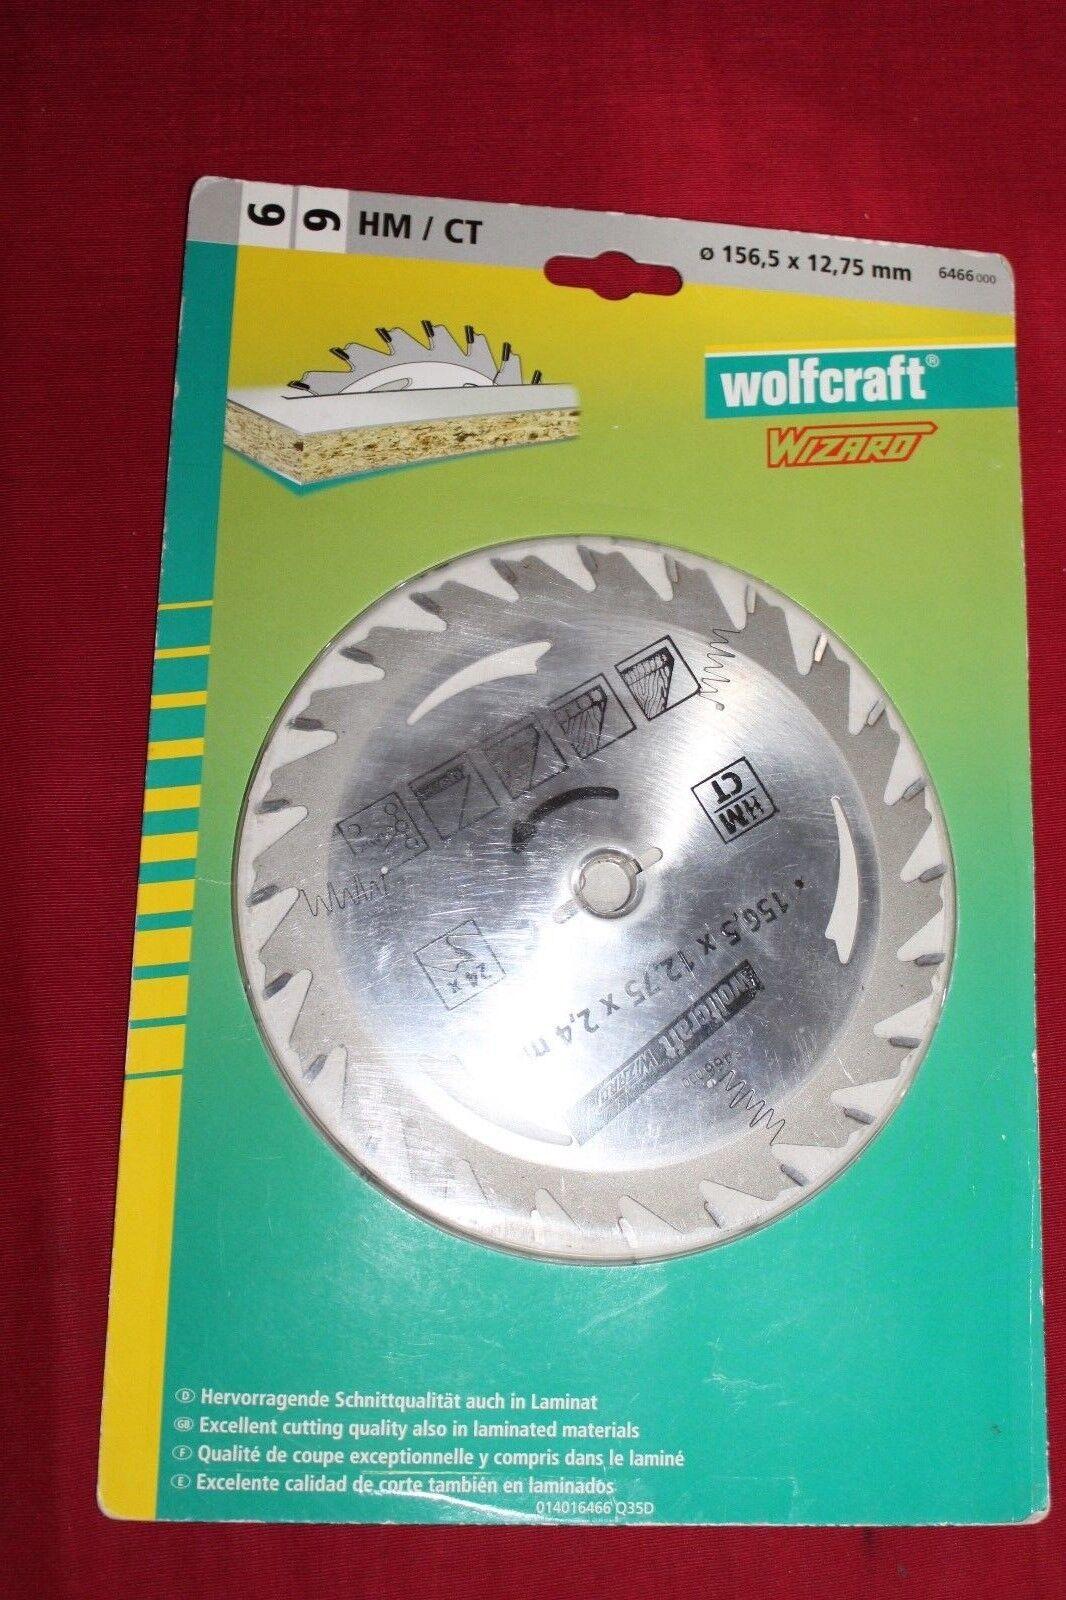 Wolfcraft Kreissägeblatt 156,5 x 12,75 x 2,4 mm 24 Zähne CV Art.Nr. 6466000